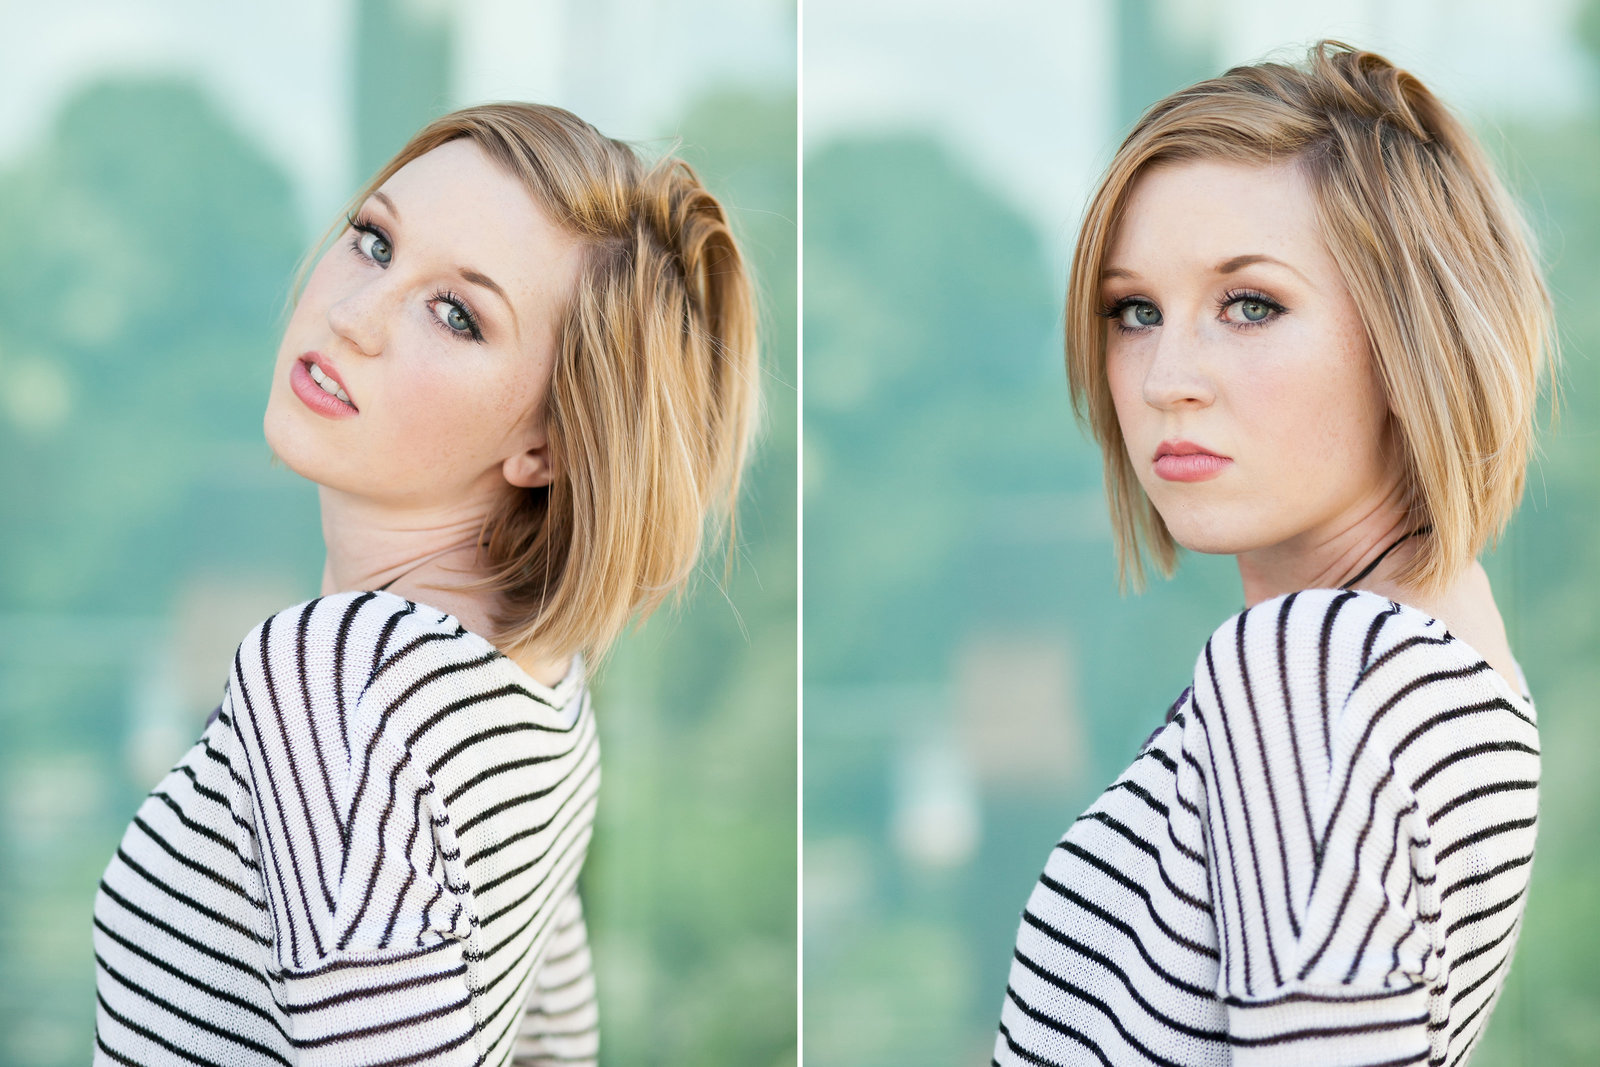 downtown portland senior portrait headshots | Susie Moreno Photography